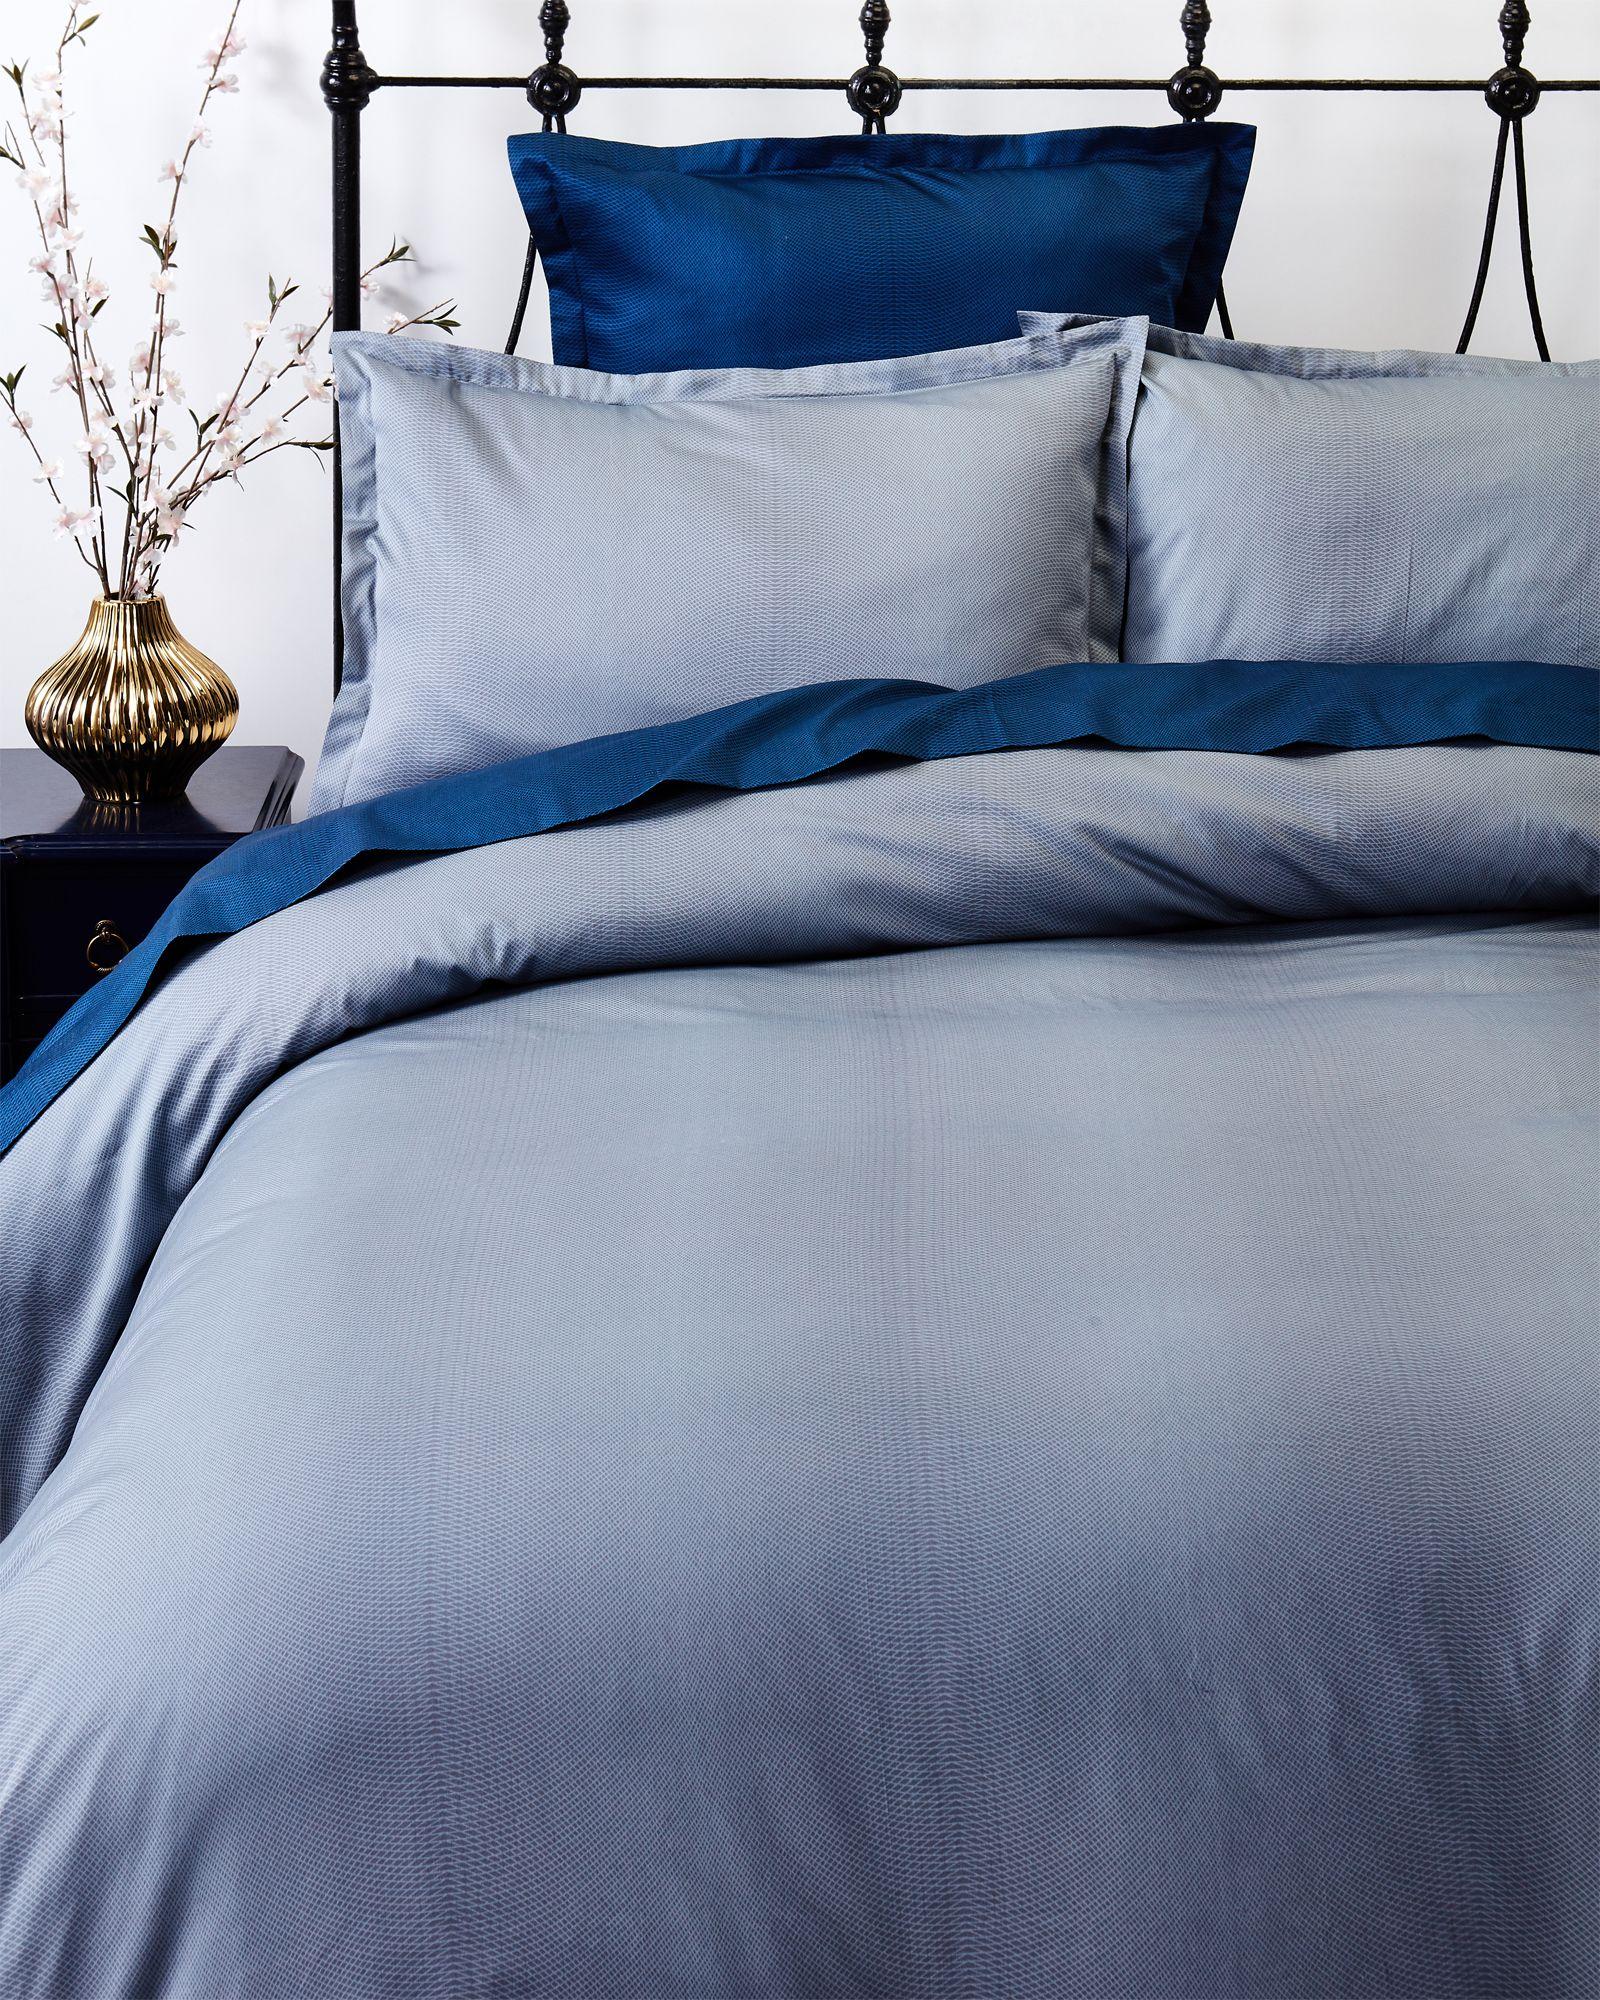 Cotton Duvet Cover Queen Macys